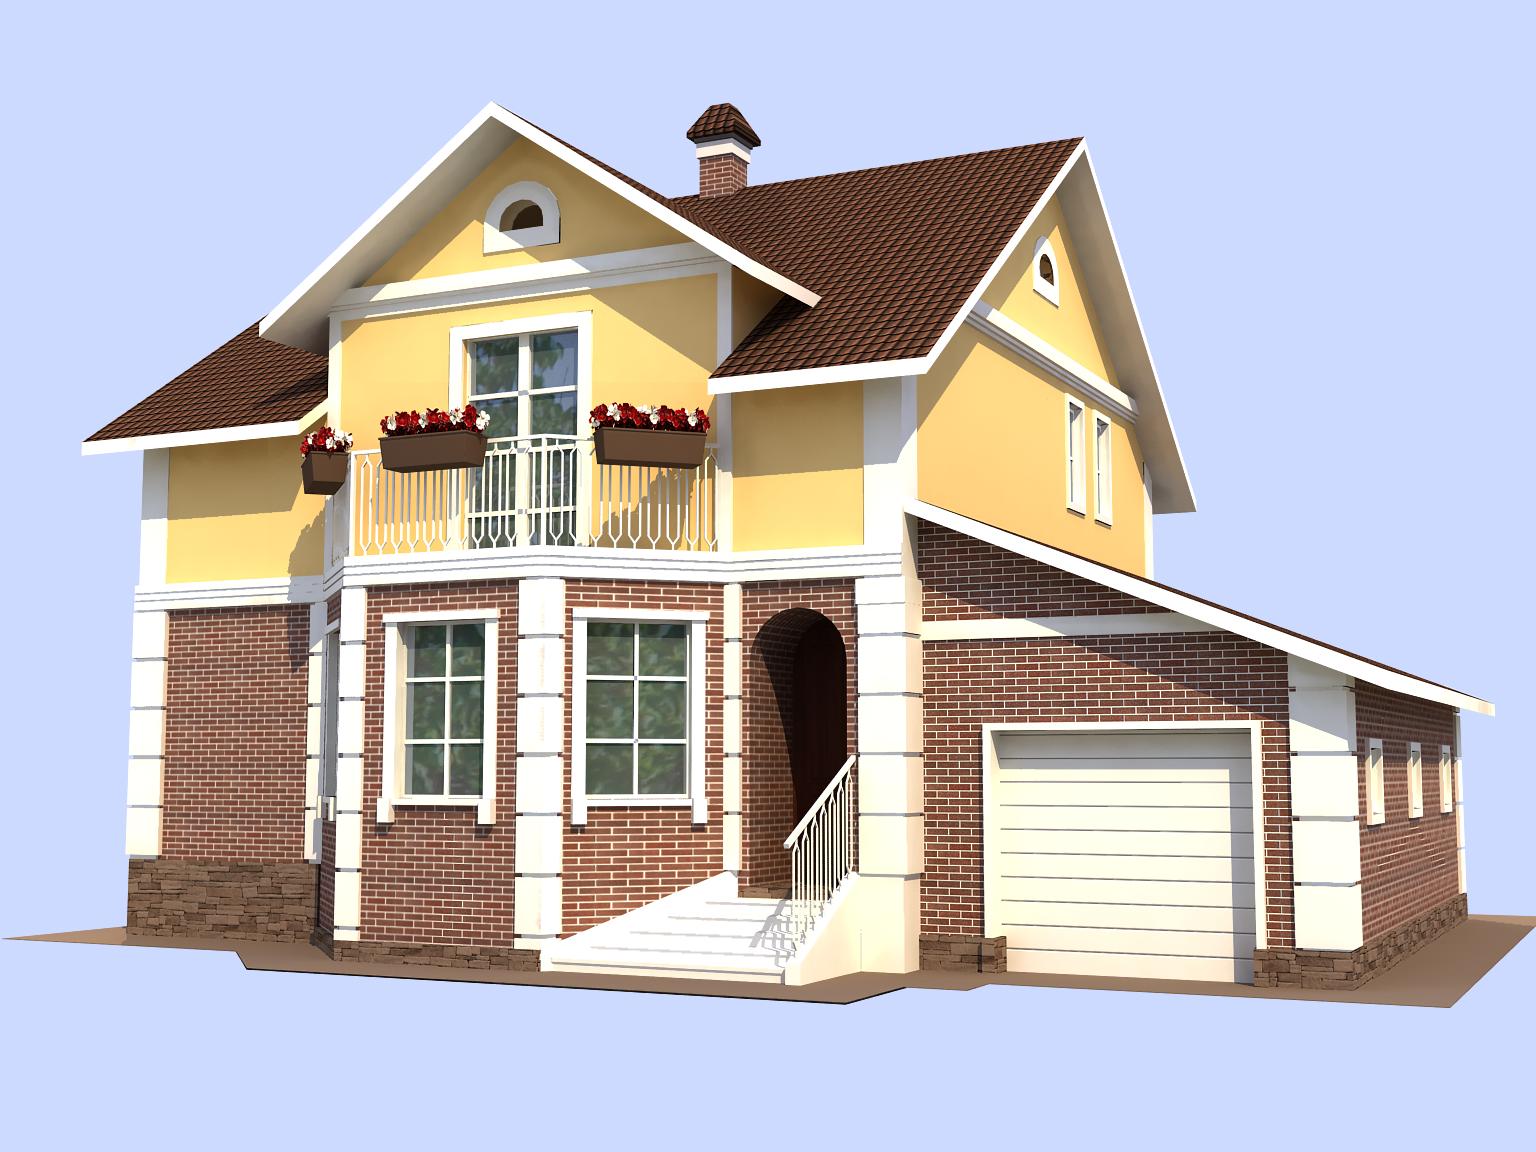 Wood House PNG Image - PurePNG   Free transparent CC0 PNG ...